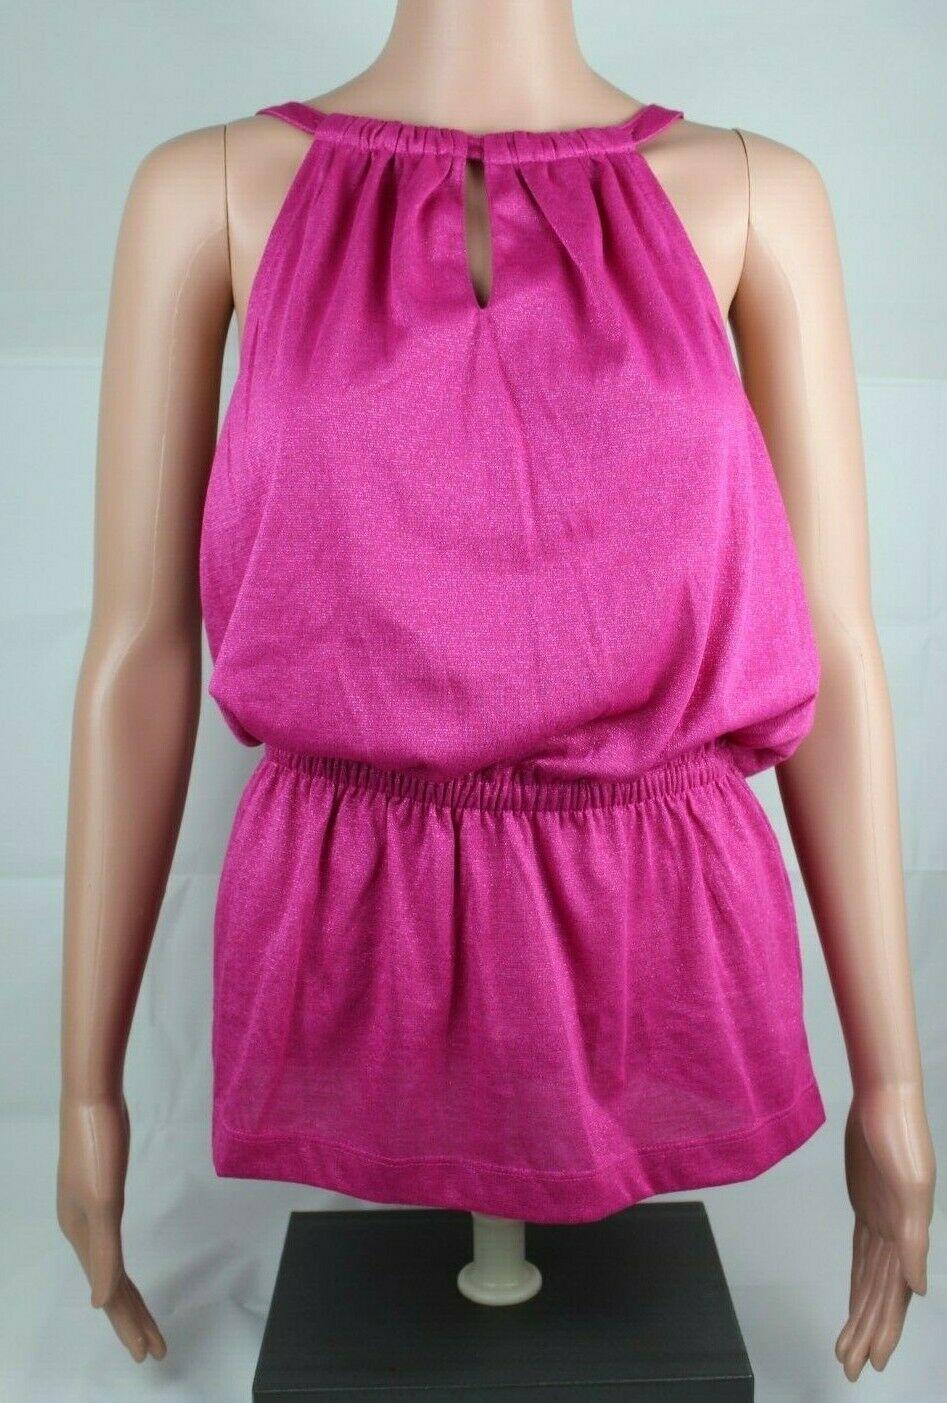 Calvin Klein women's top sleeveless pink glitter size S/P